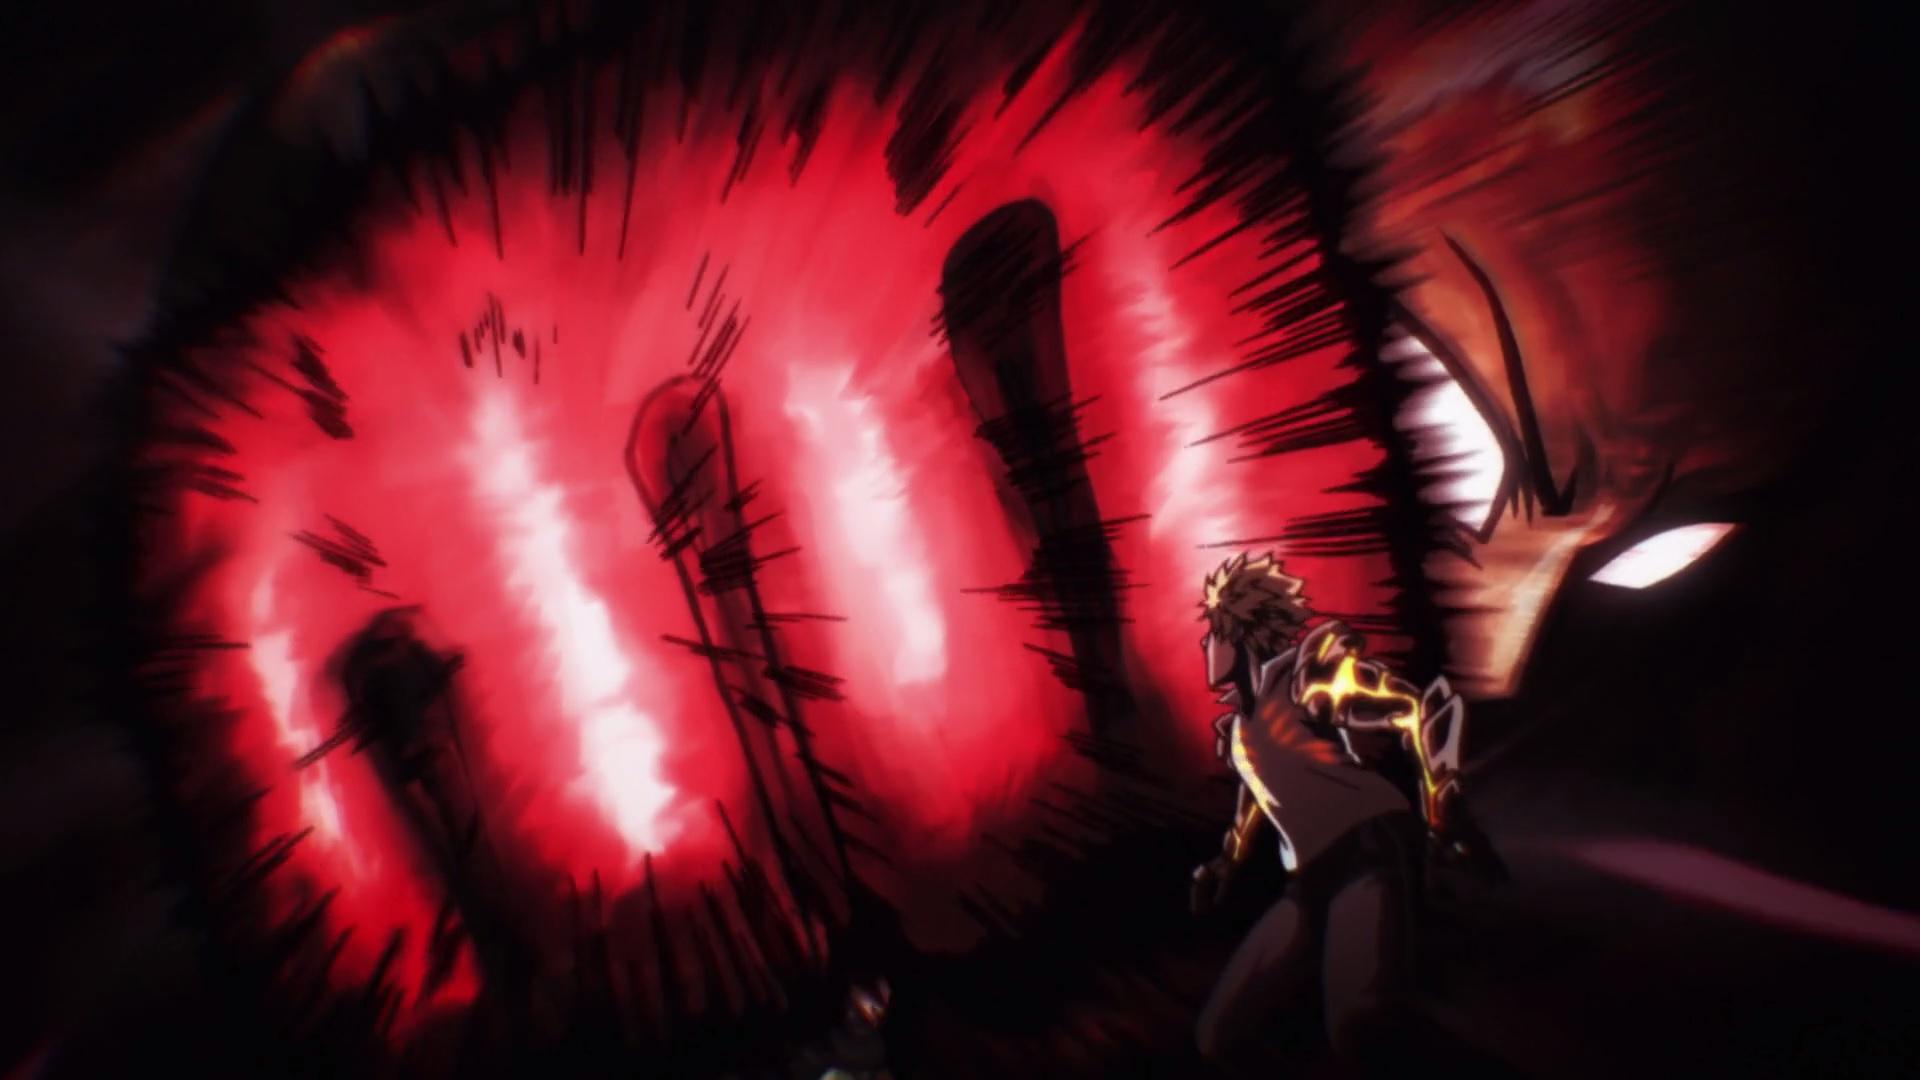 Аниме Ванпанчмен, One Punch Man - крутые обои на рабочий стол 15